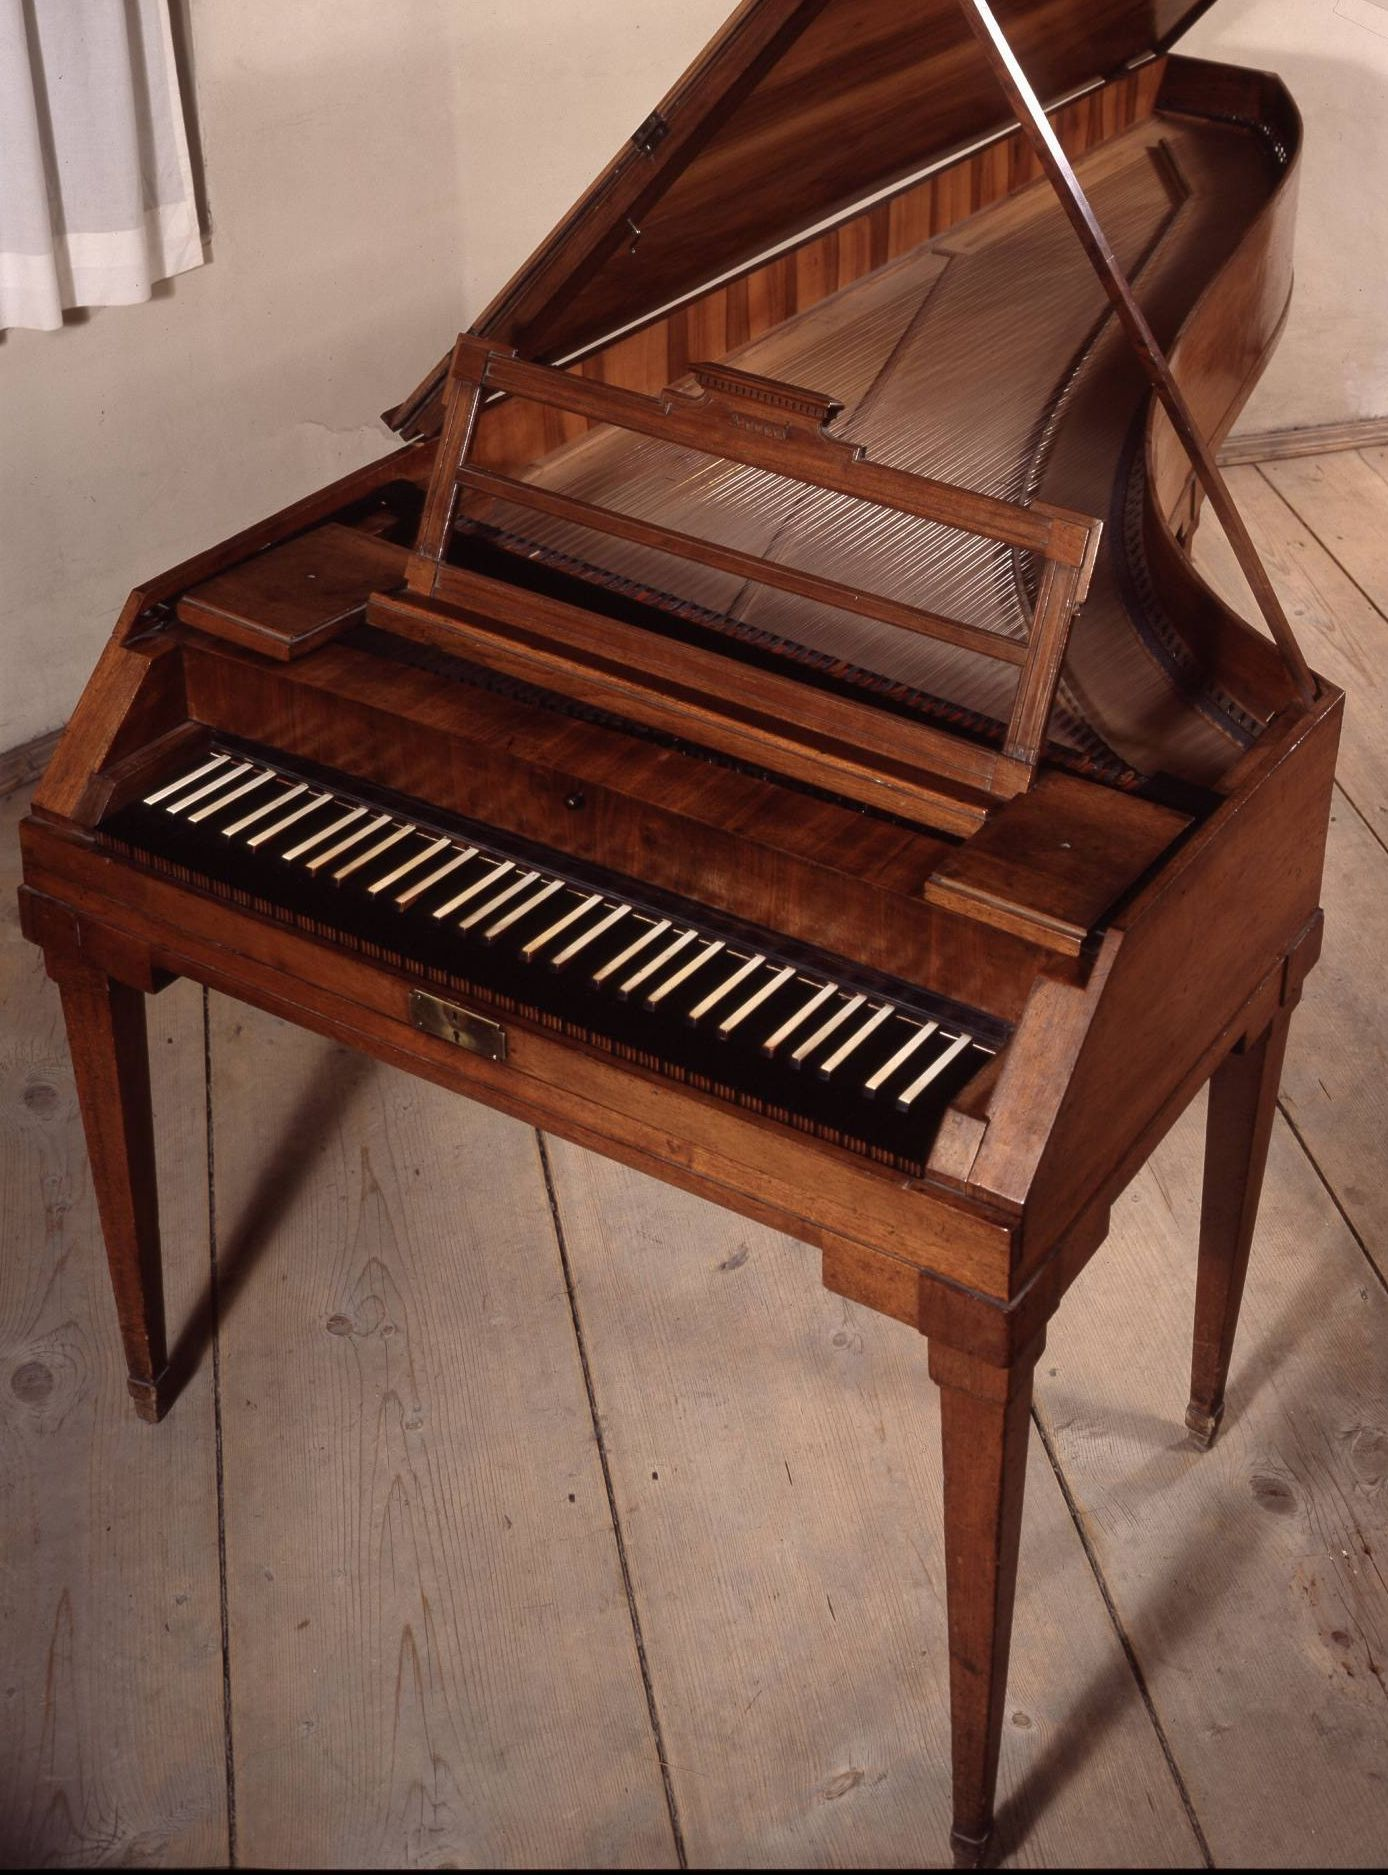 Mozart's original instruments